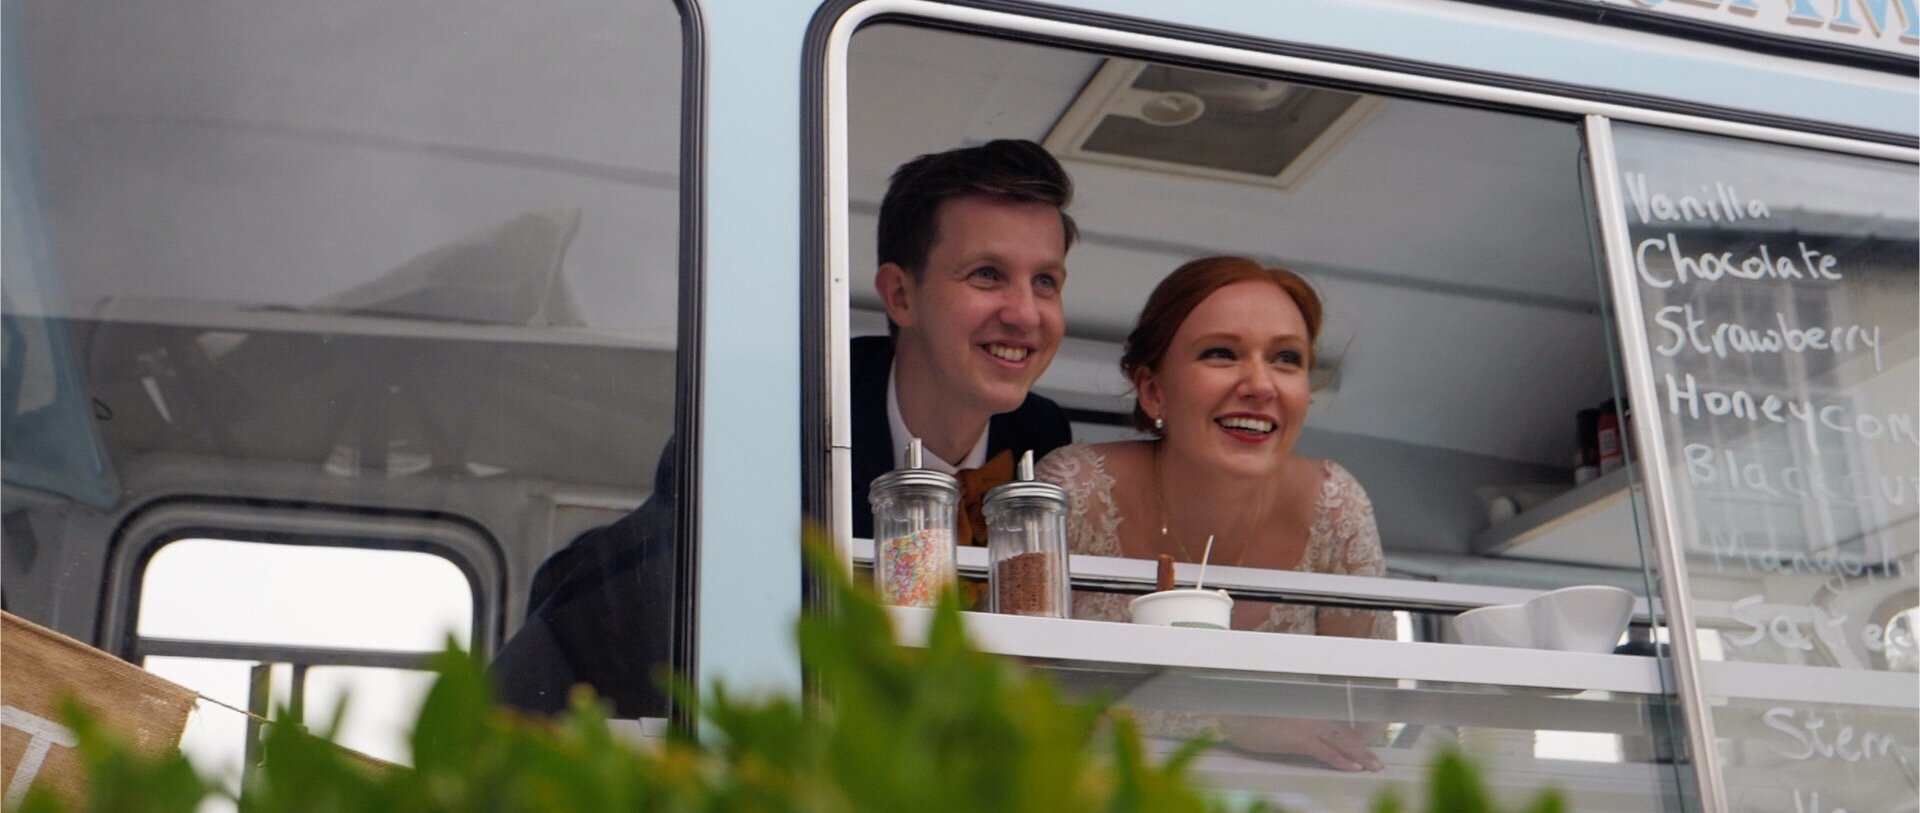 Wedding Ice Cream Van Essex Video.jpg